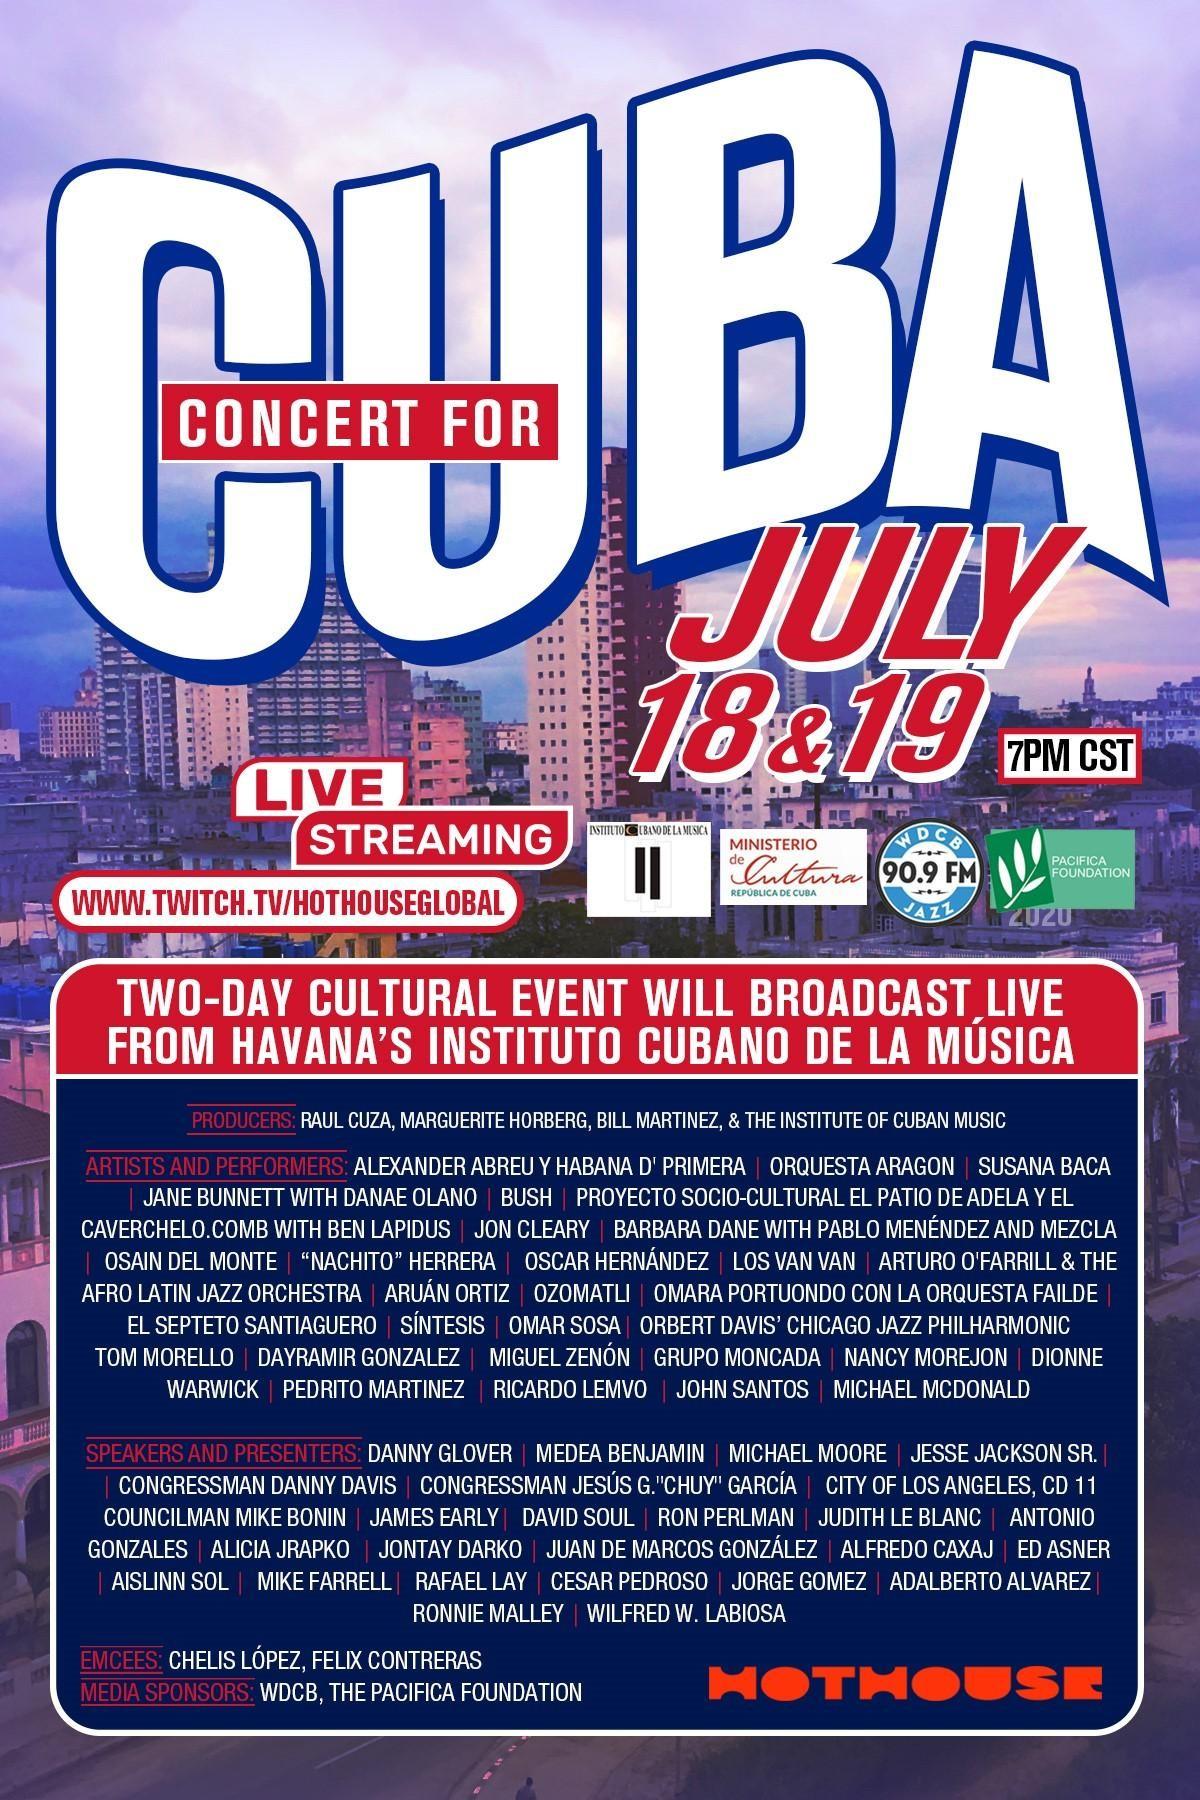 Concert for Cuba